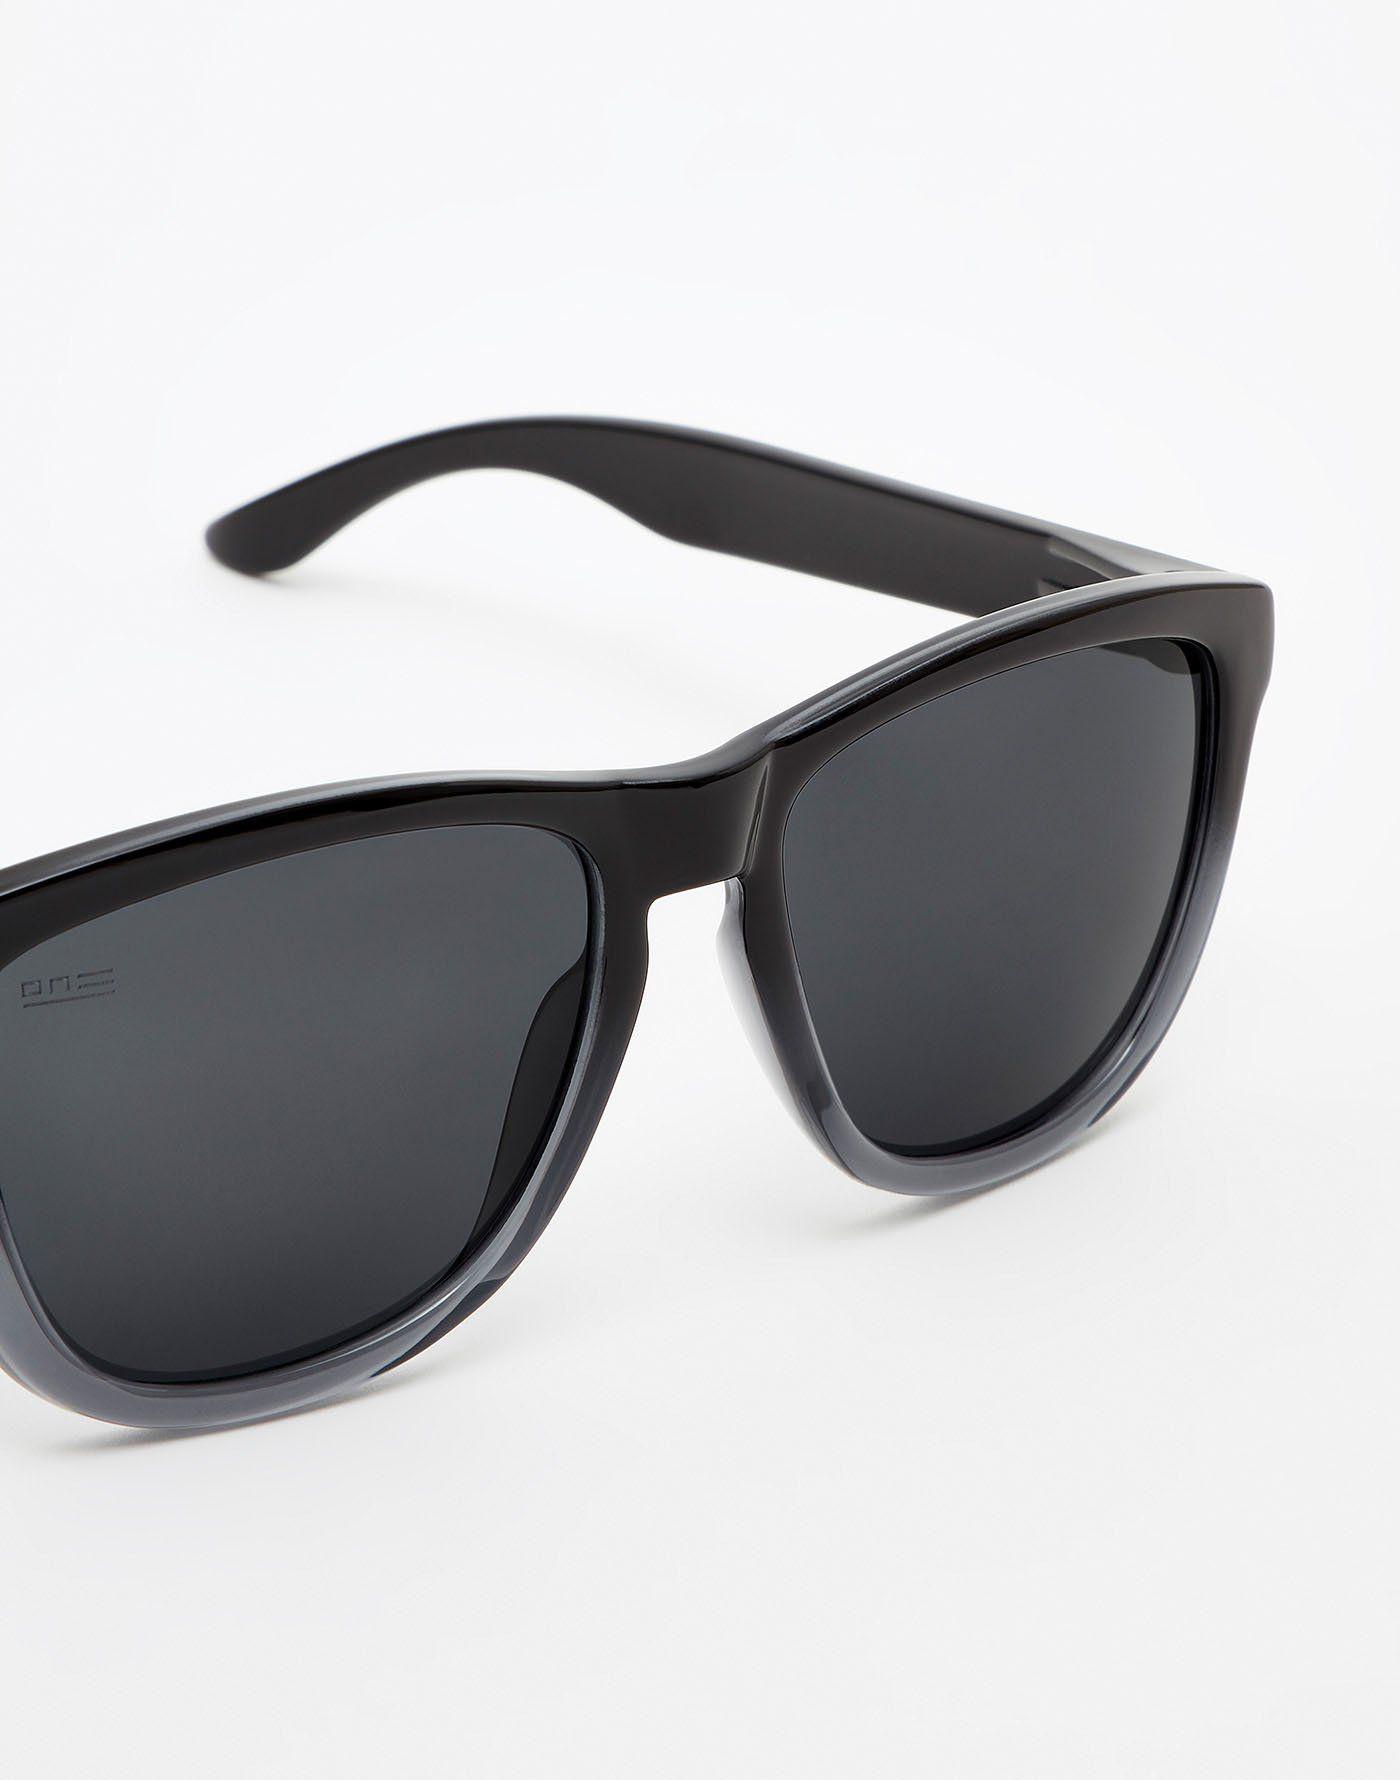 Dark Hombre For Men One De Fusion Sol · Sunglasses 2019Gafas In SUMGzqpV